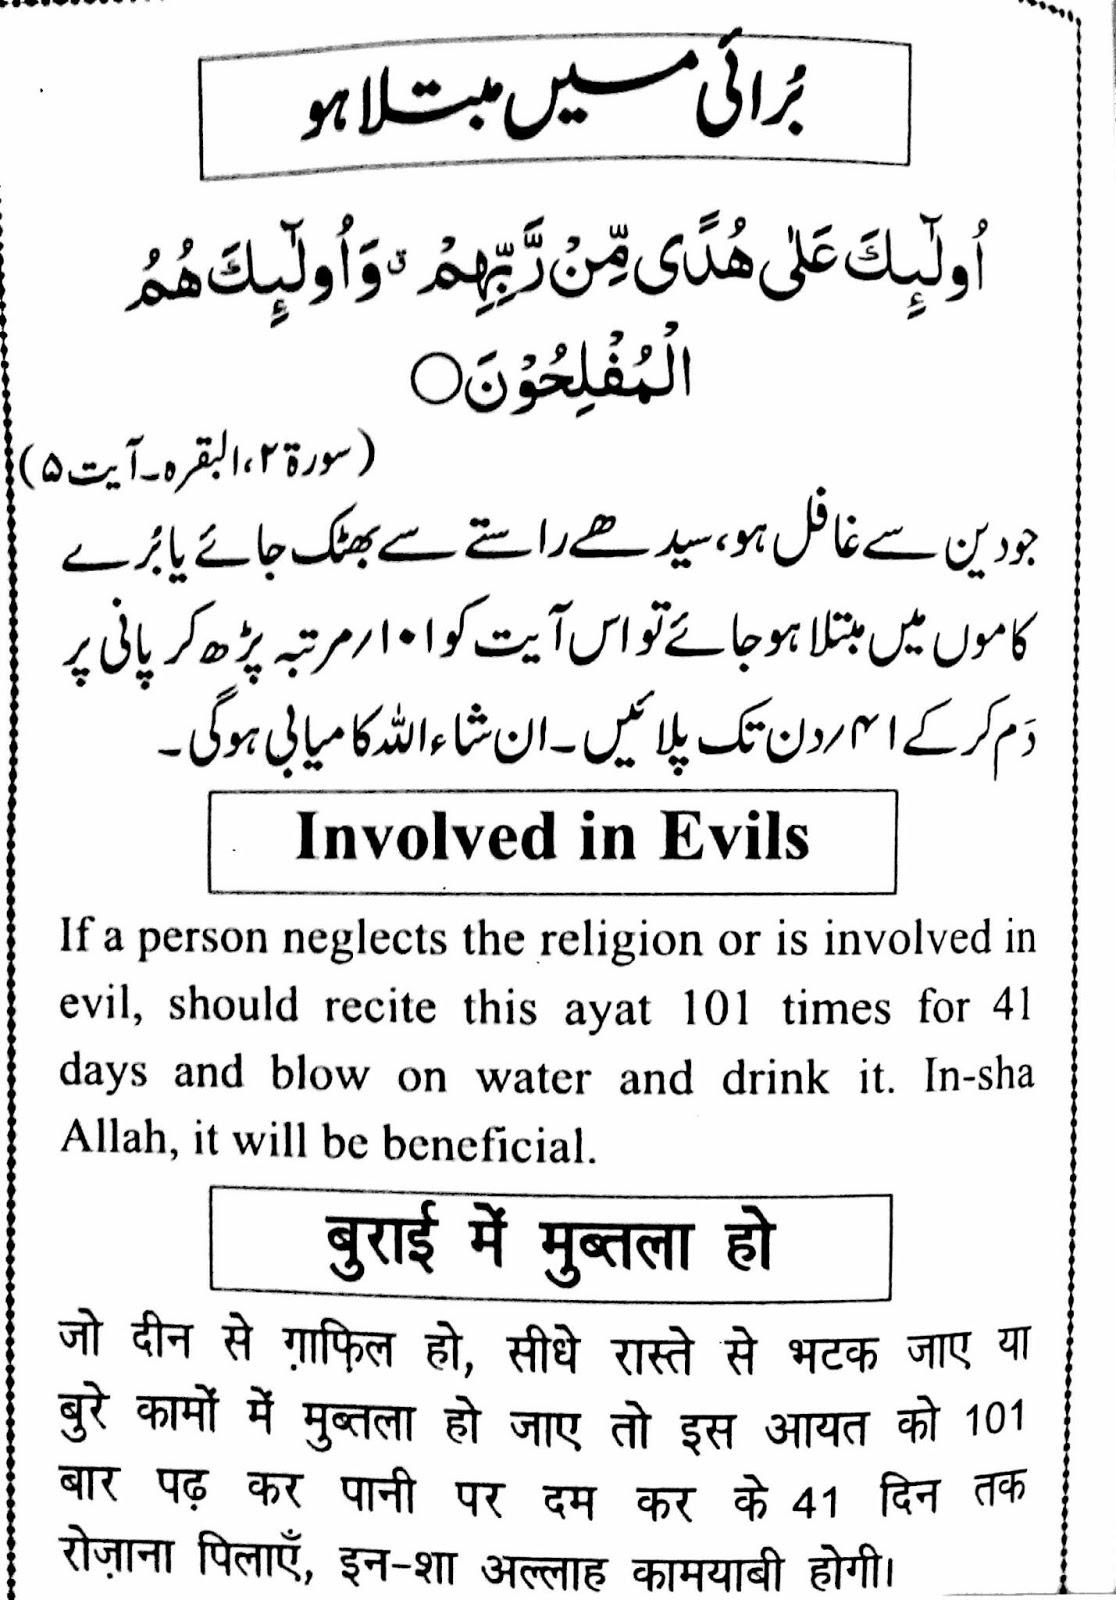 Wazifa surah ala for pain of ear - Wazifa,wazaif,Amaliyat in